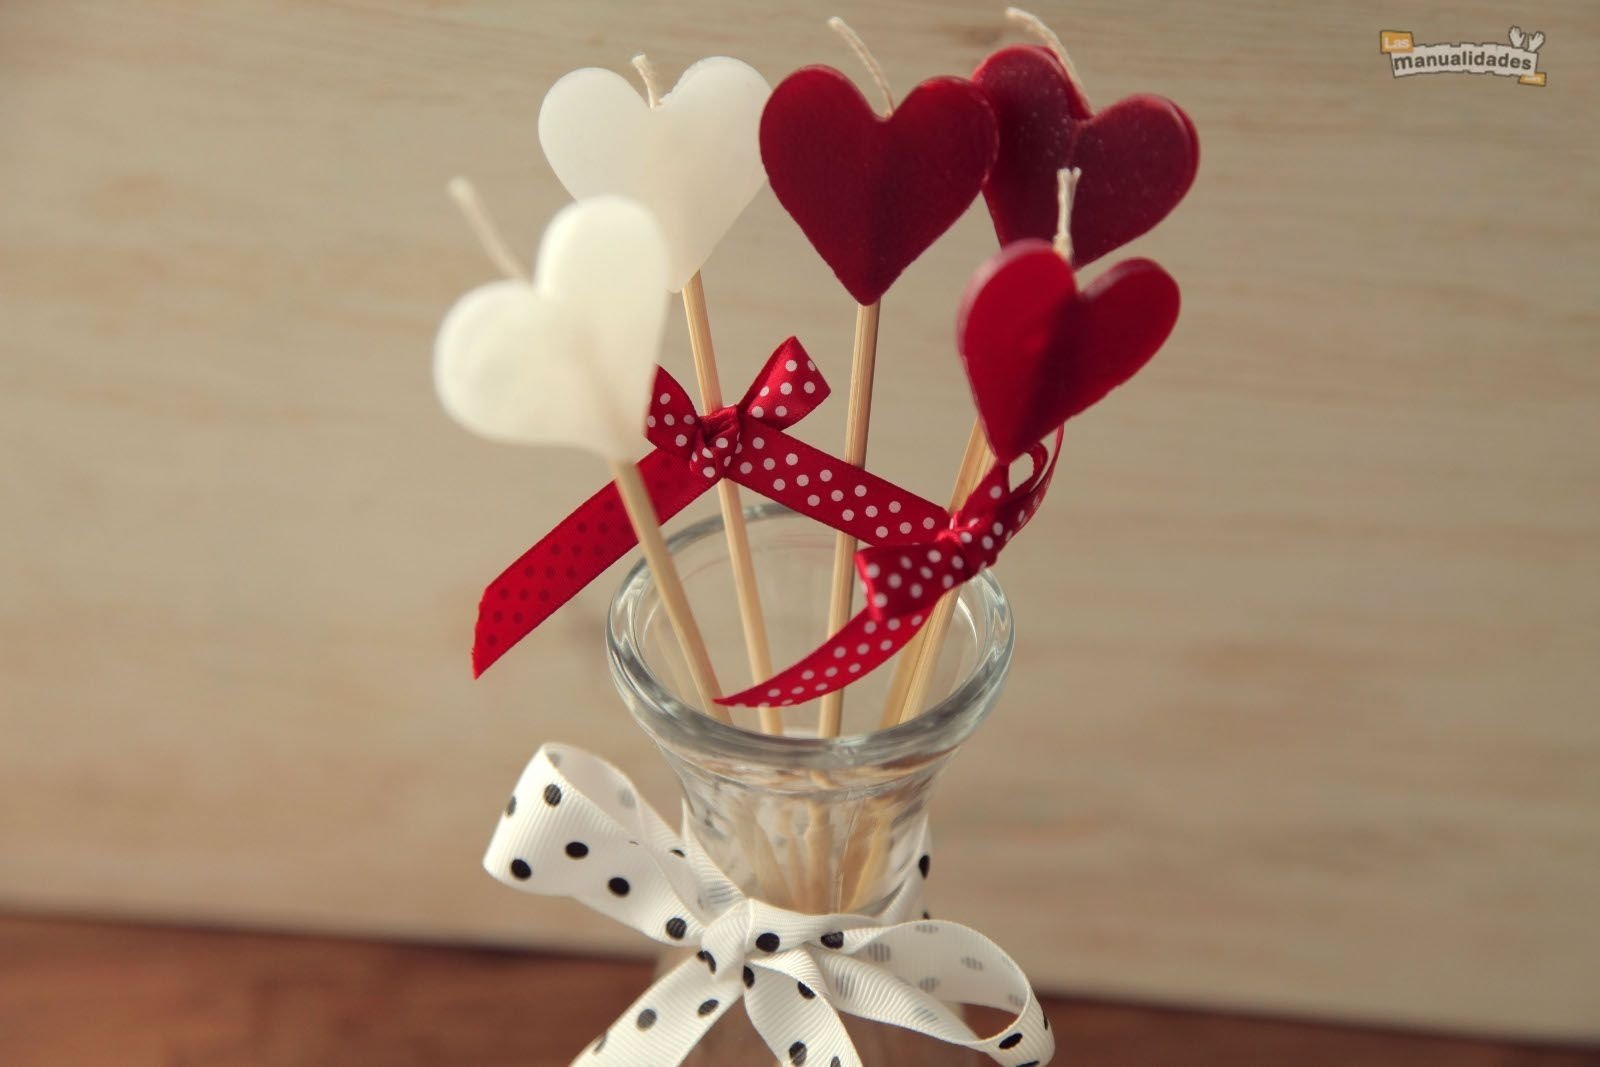 10 Pretty Ideas Para El Dia De San Valentin manualidades para el dia de los enamorados san valentin 2021